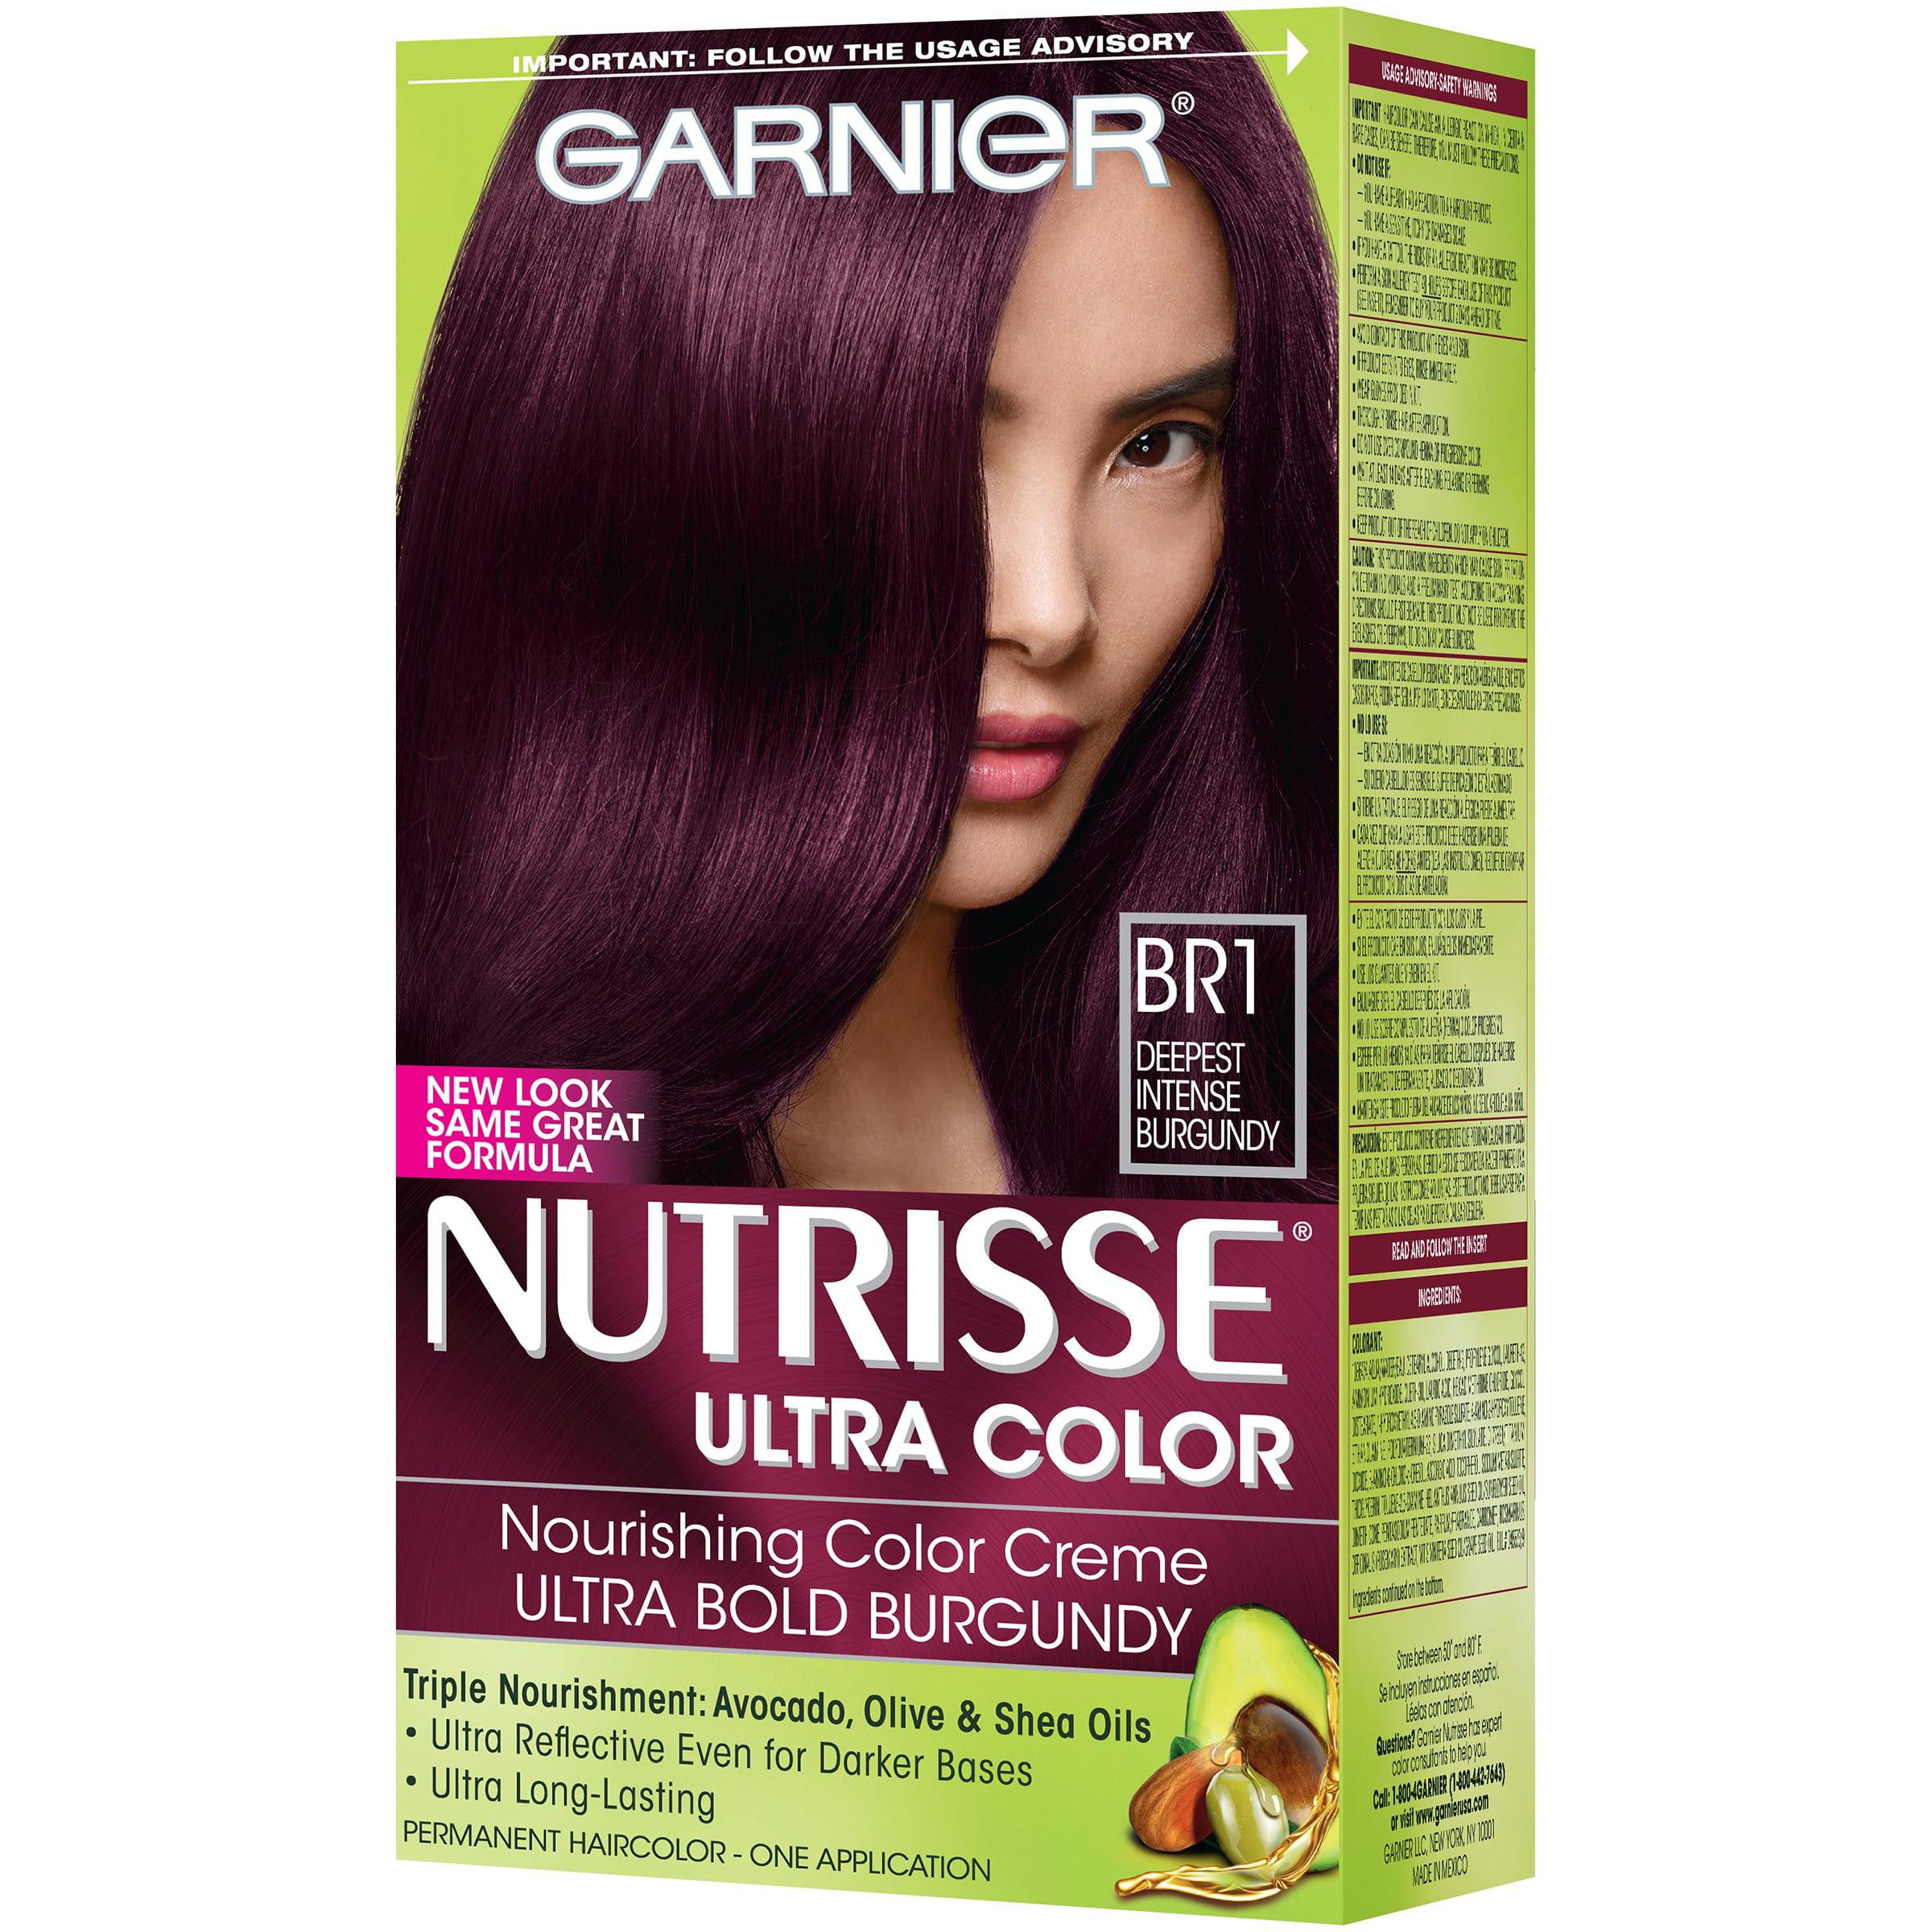 Garnier Nutrisse Ultra Color Nourishing Hair Creme R2 Medium Intense Auburn